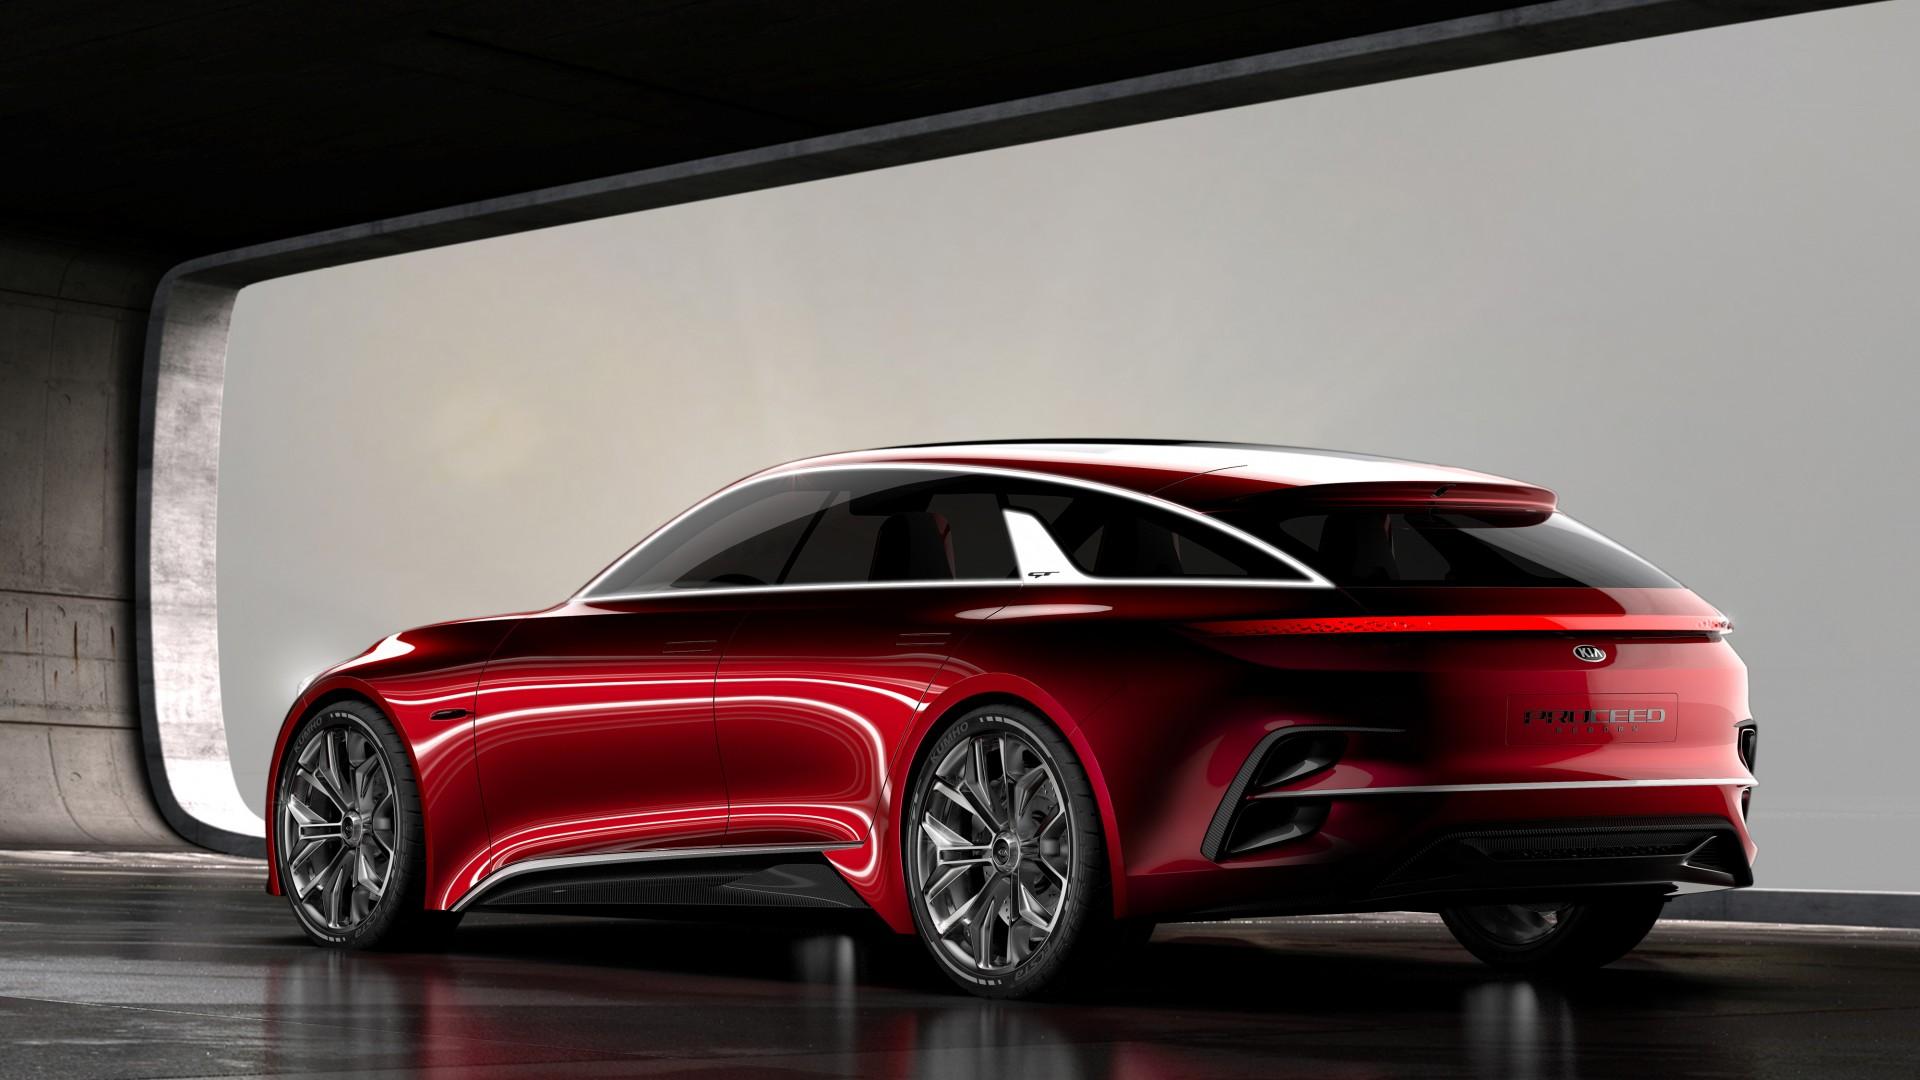 Superman Desktop Wallpaper Hd Kia Proceed Concept 2017 Frankfurt Motor Show 4k 3